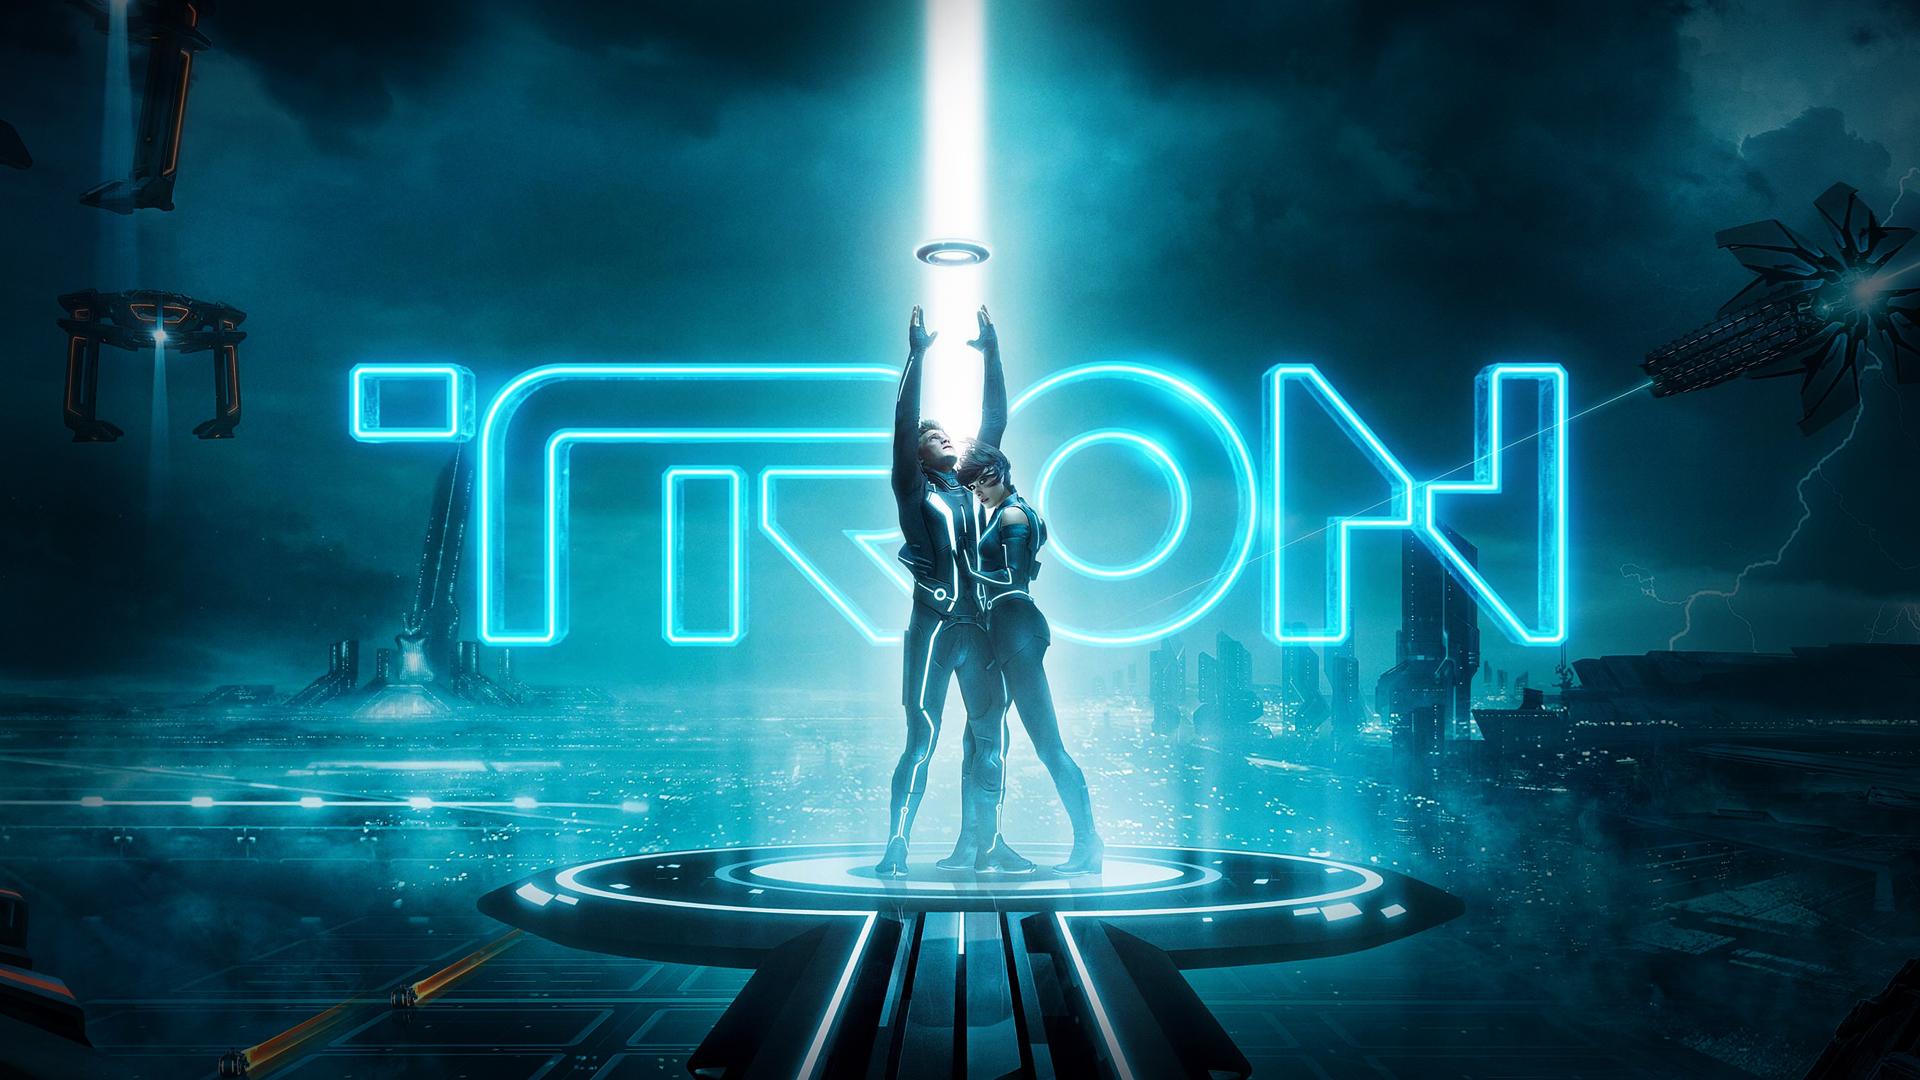 Tron Legacy Wallpaper with High Resolution Wallpaper 3d Desktop